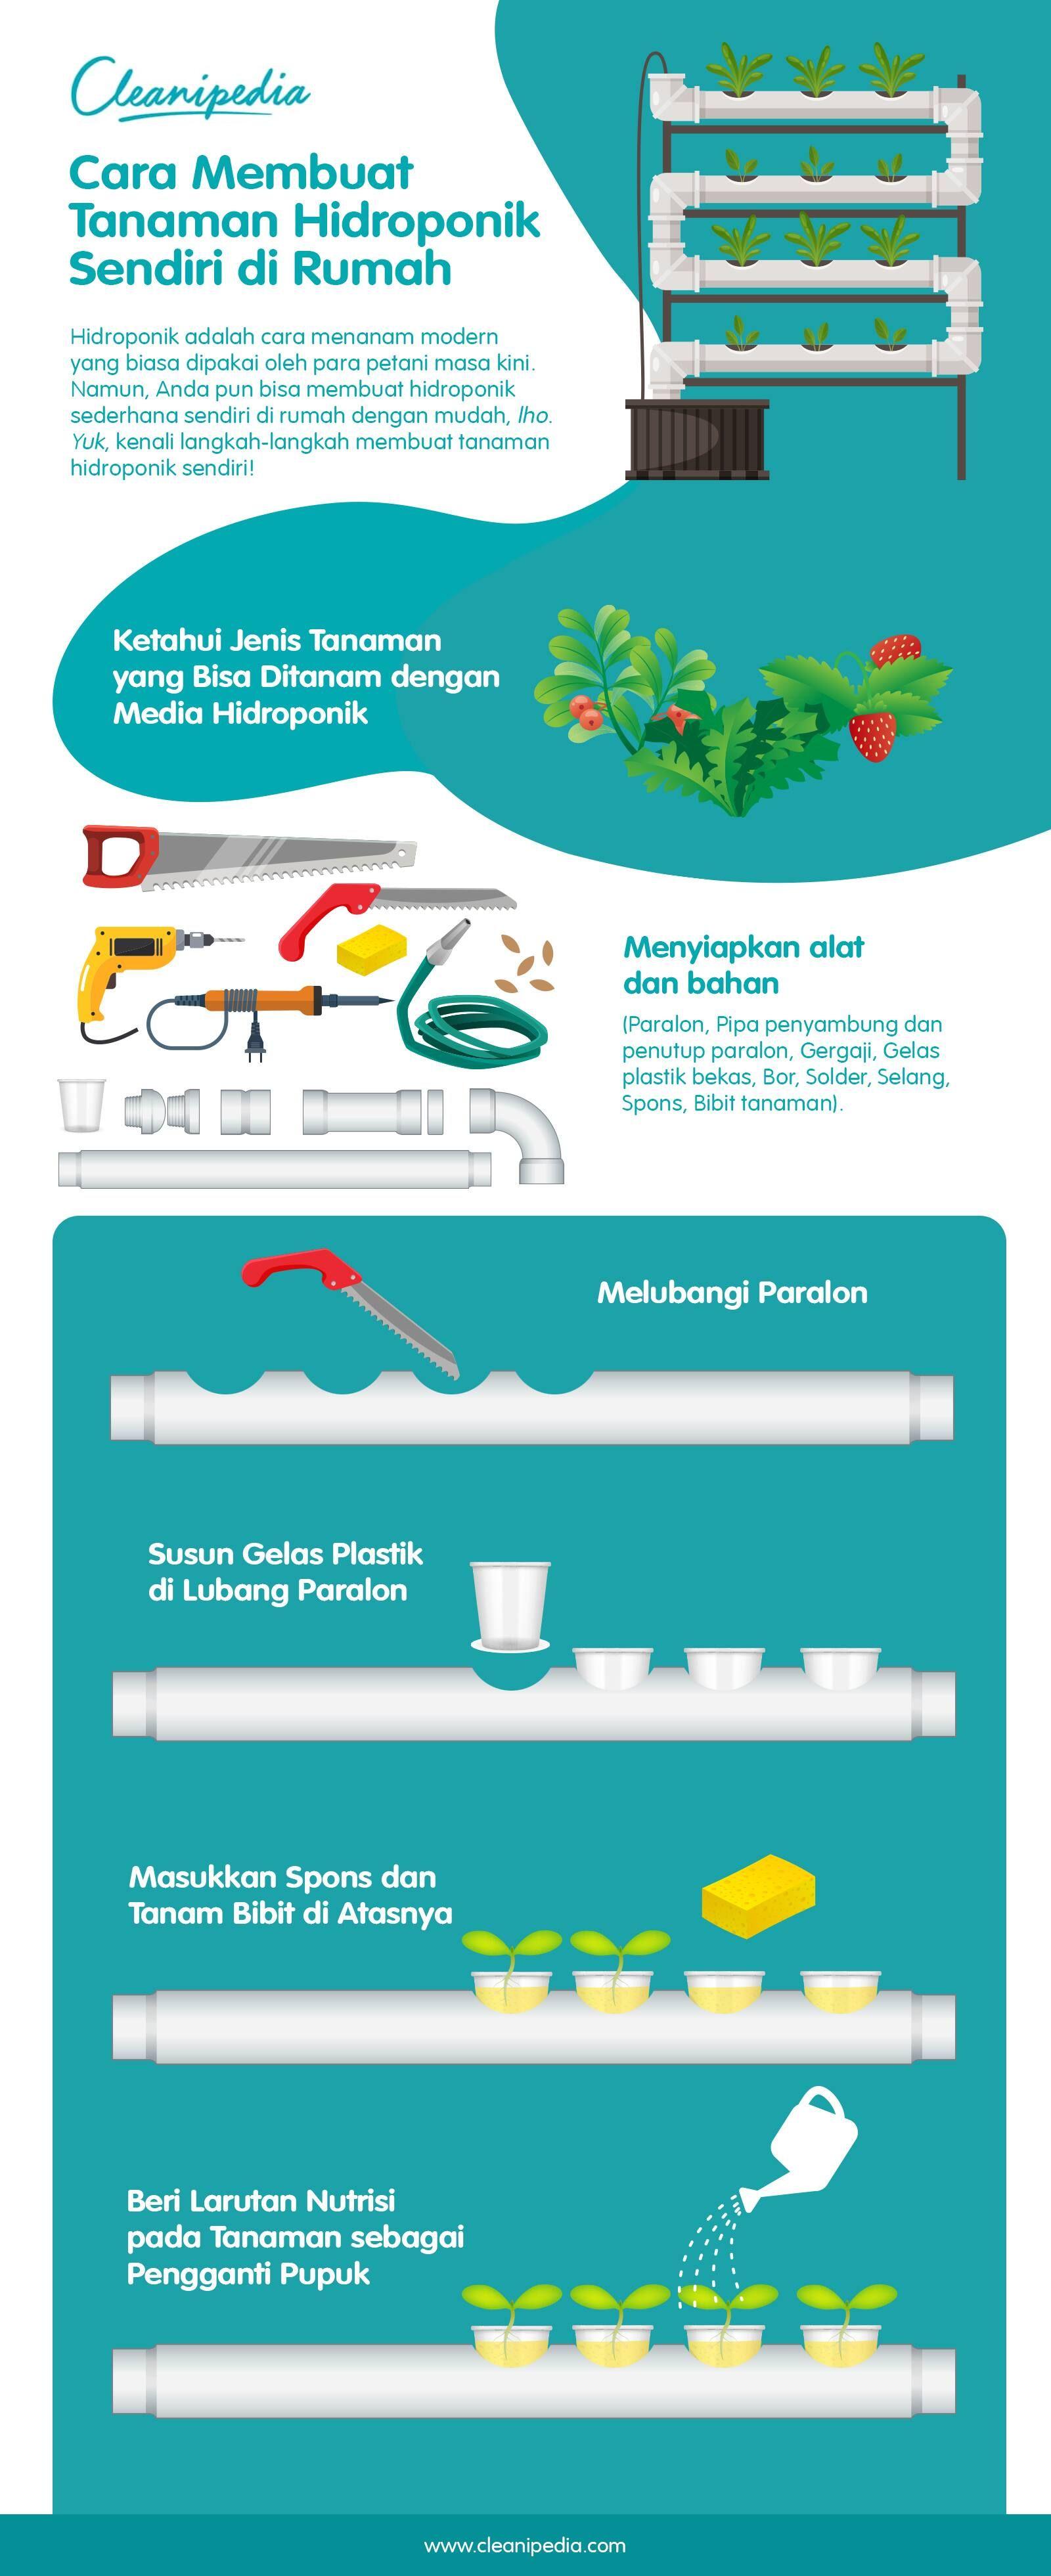 Infografik: Cara Membuat Tanaman Hidroponik Sendiri di Rumah